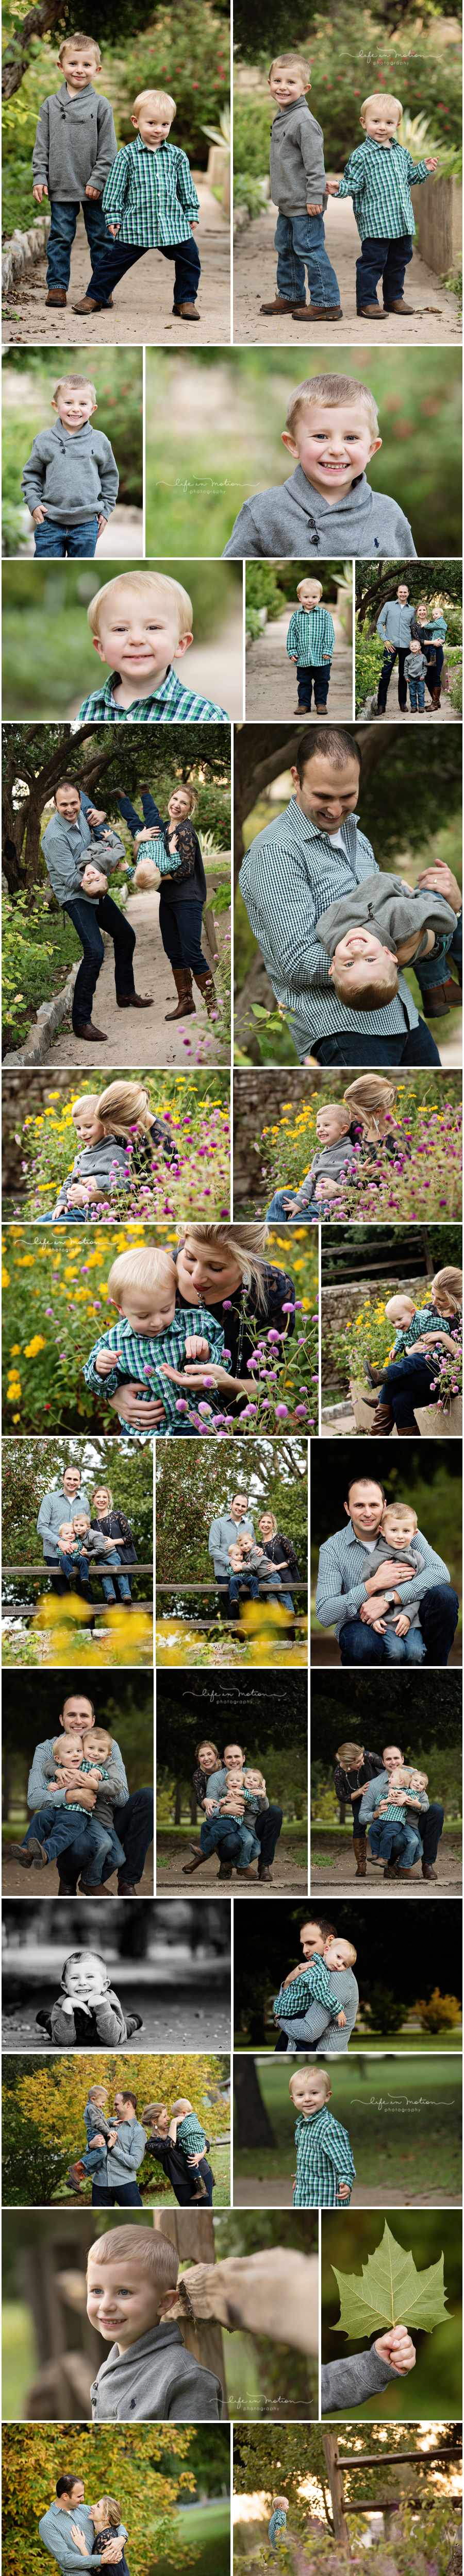 _stradtner_georgetown_texas_lifestyle_family_photographer